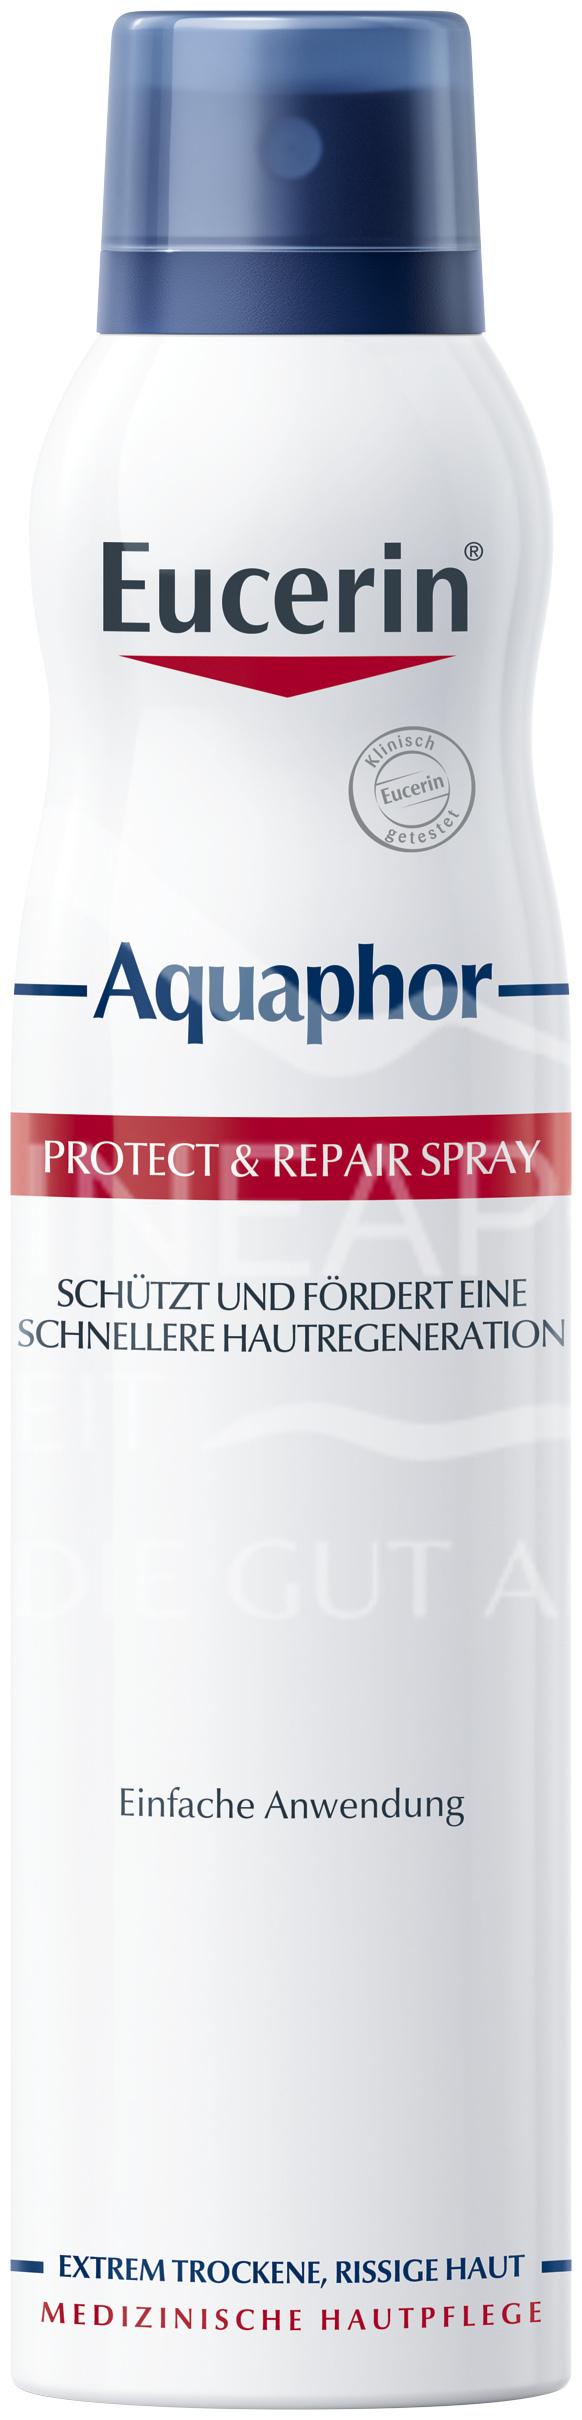 Eucerin® Aquaphor Protect&Repair Spray